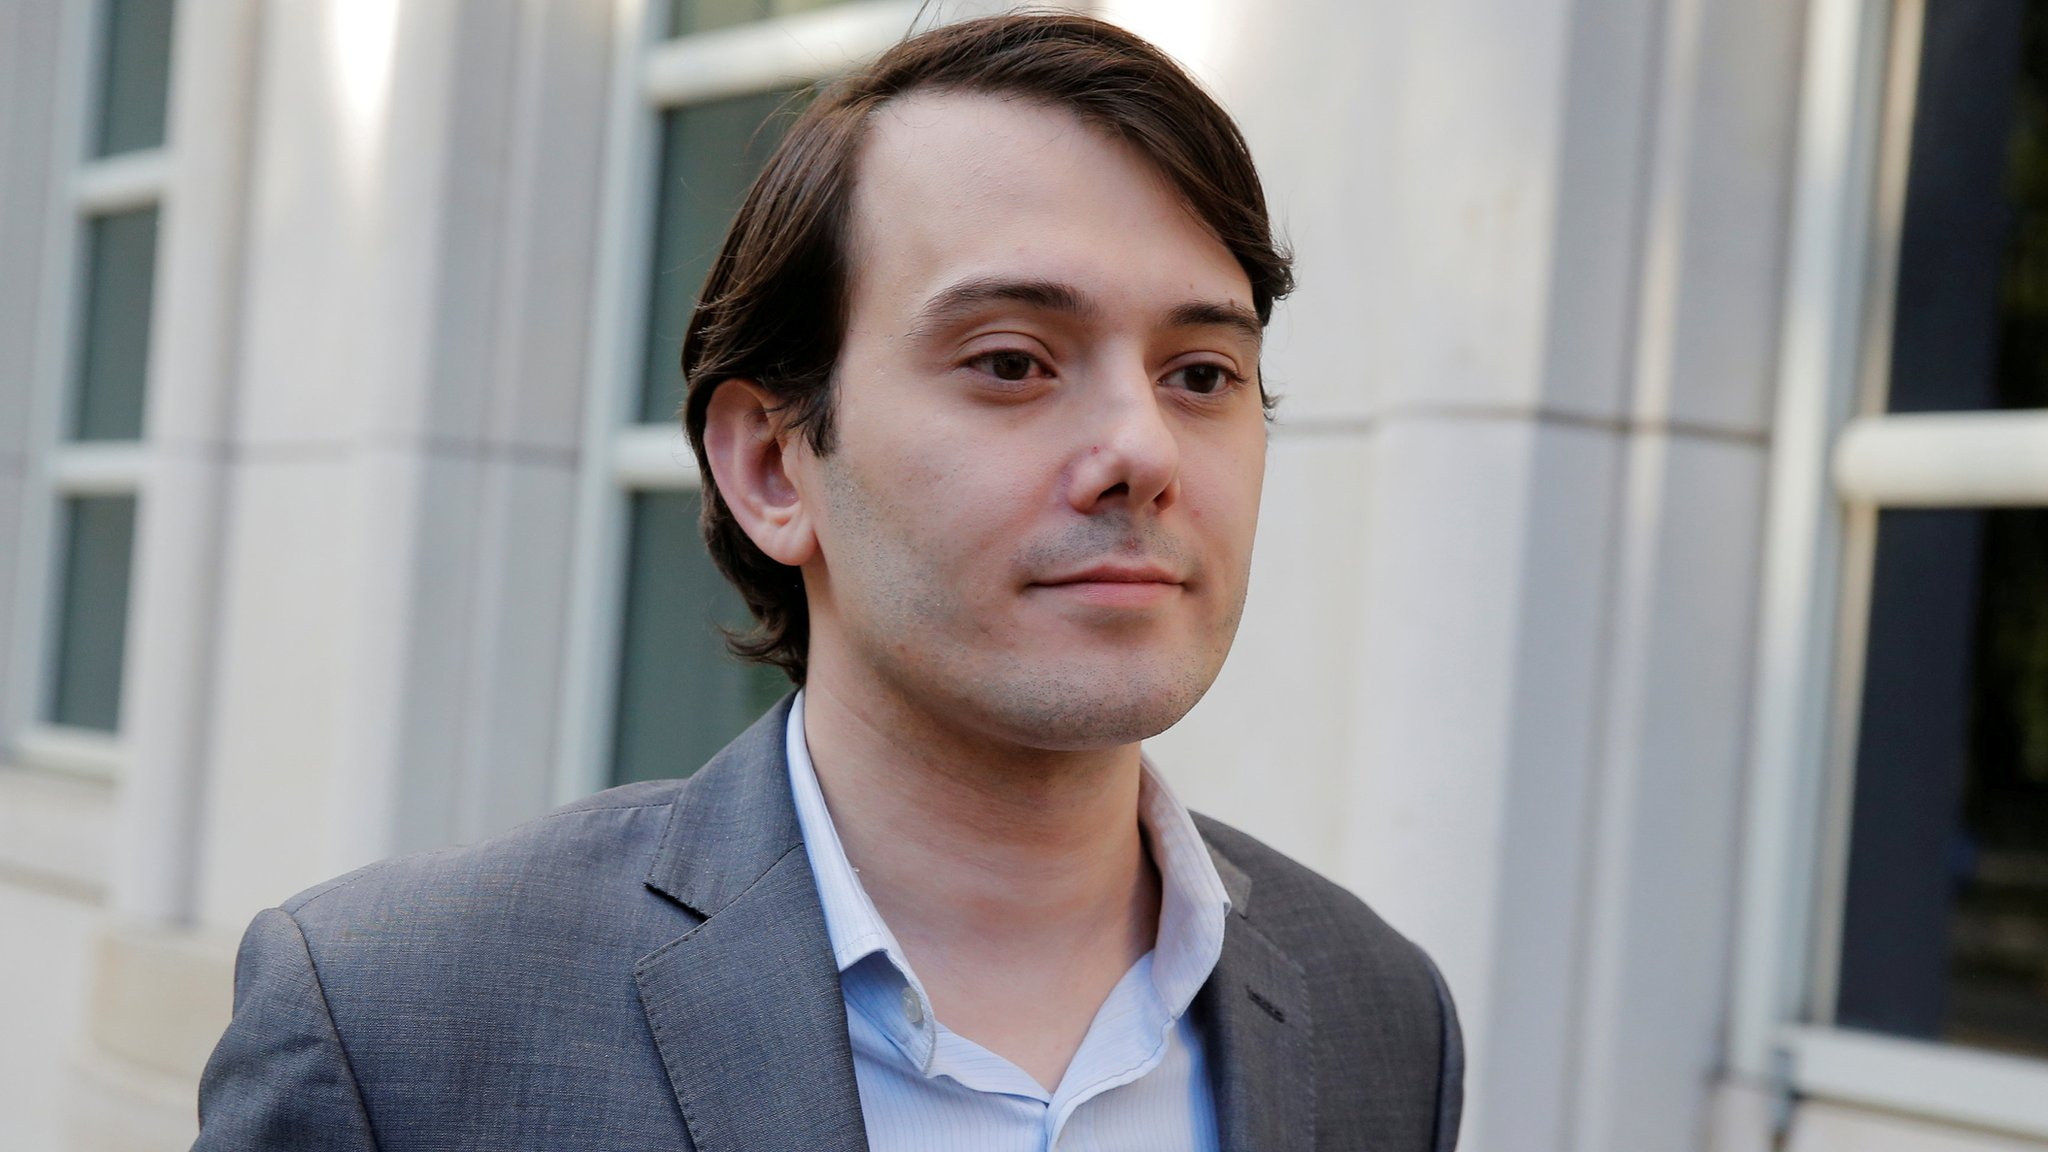 'Pharma bro' Martin Shkreli sentenced to seven years